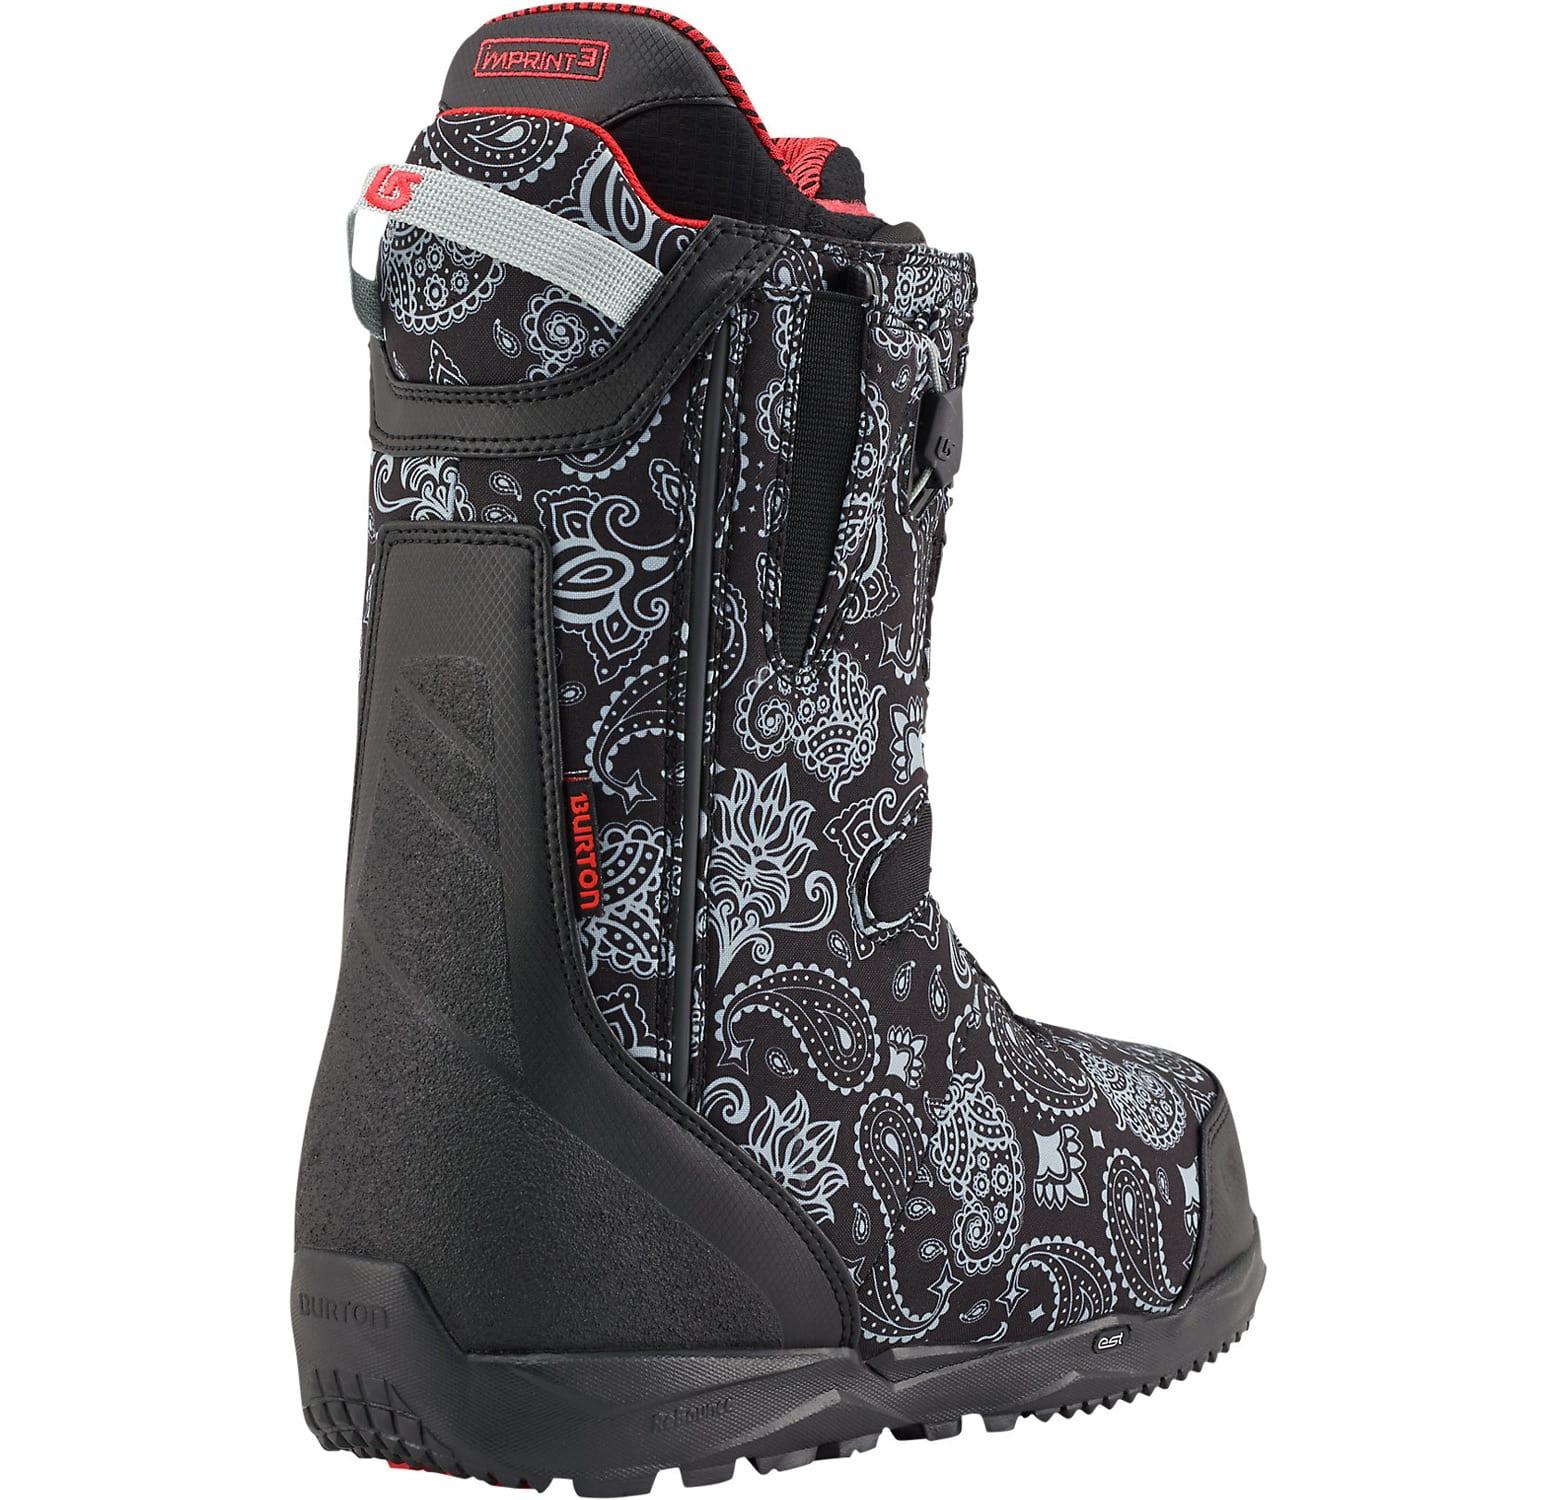 10a0e140e9 Burton Ambush Snowboard Boots - thumbnail 2